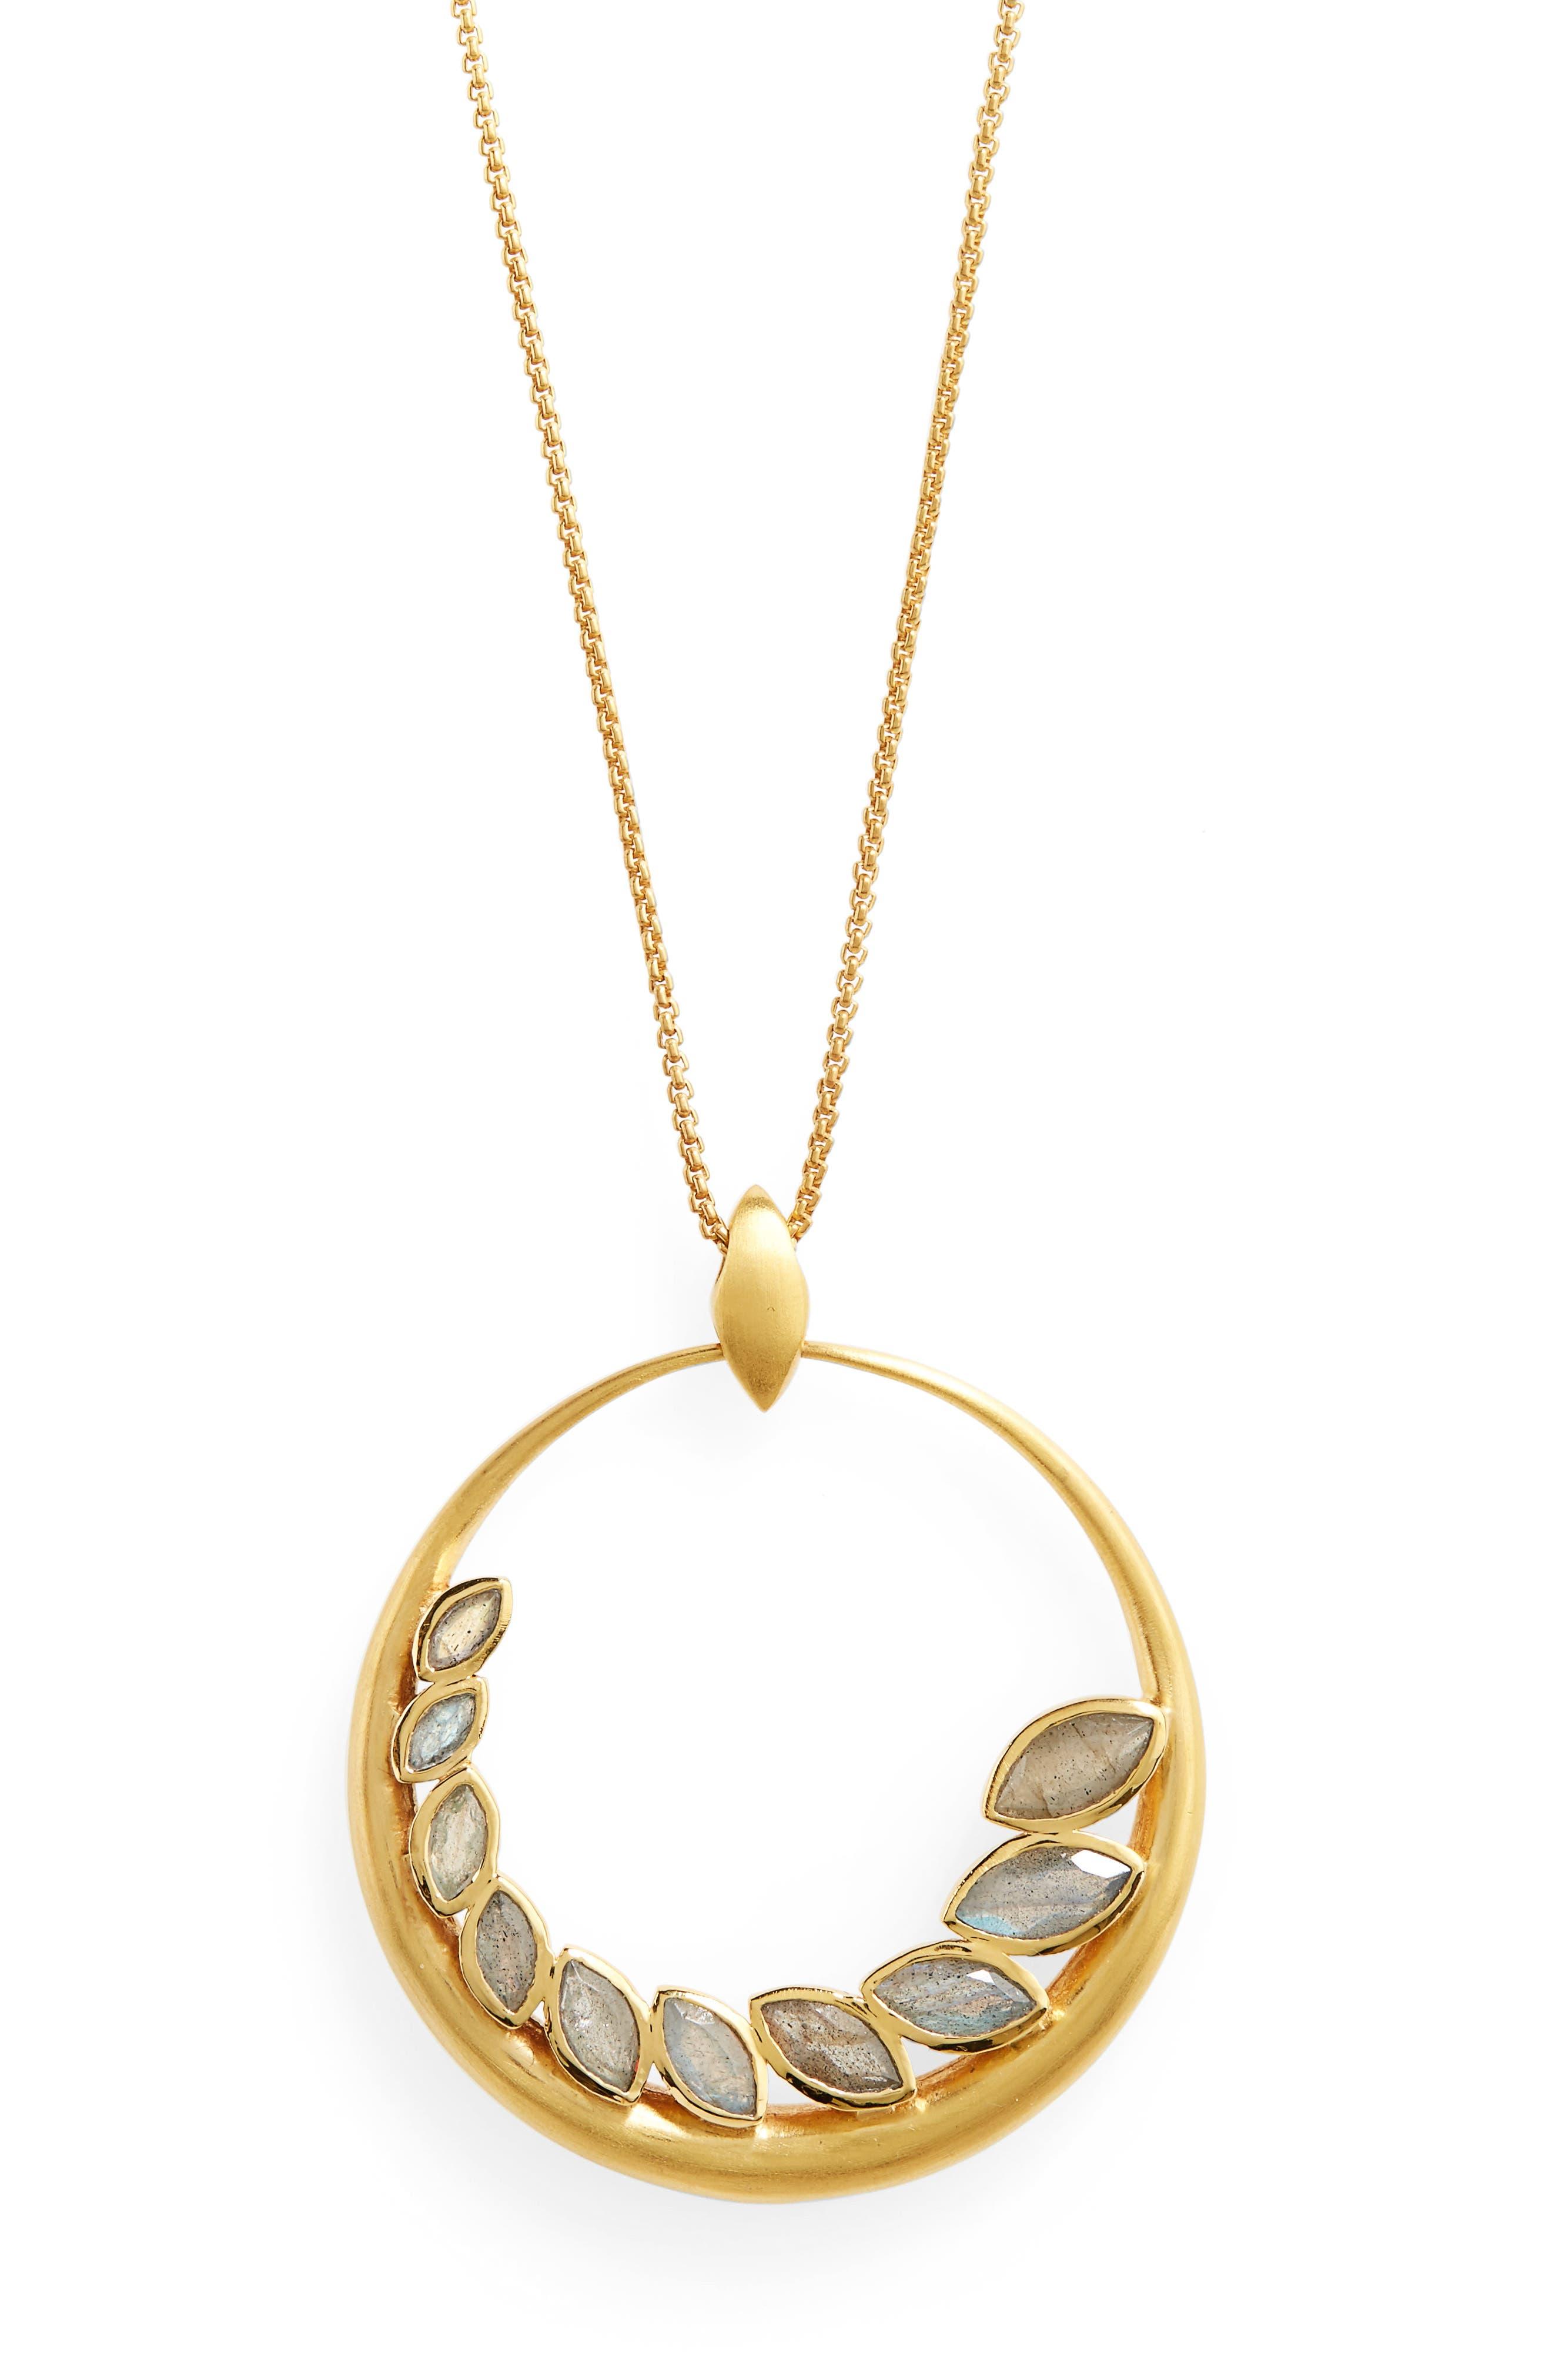 Kamala Pendant Necklace,                             Alternate thumbnail 2, color,                             Labradorite/ Gold